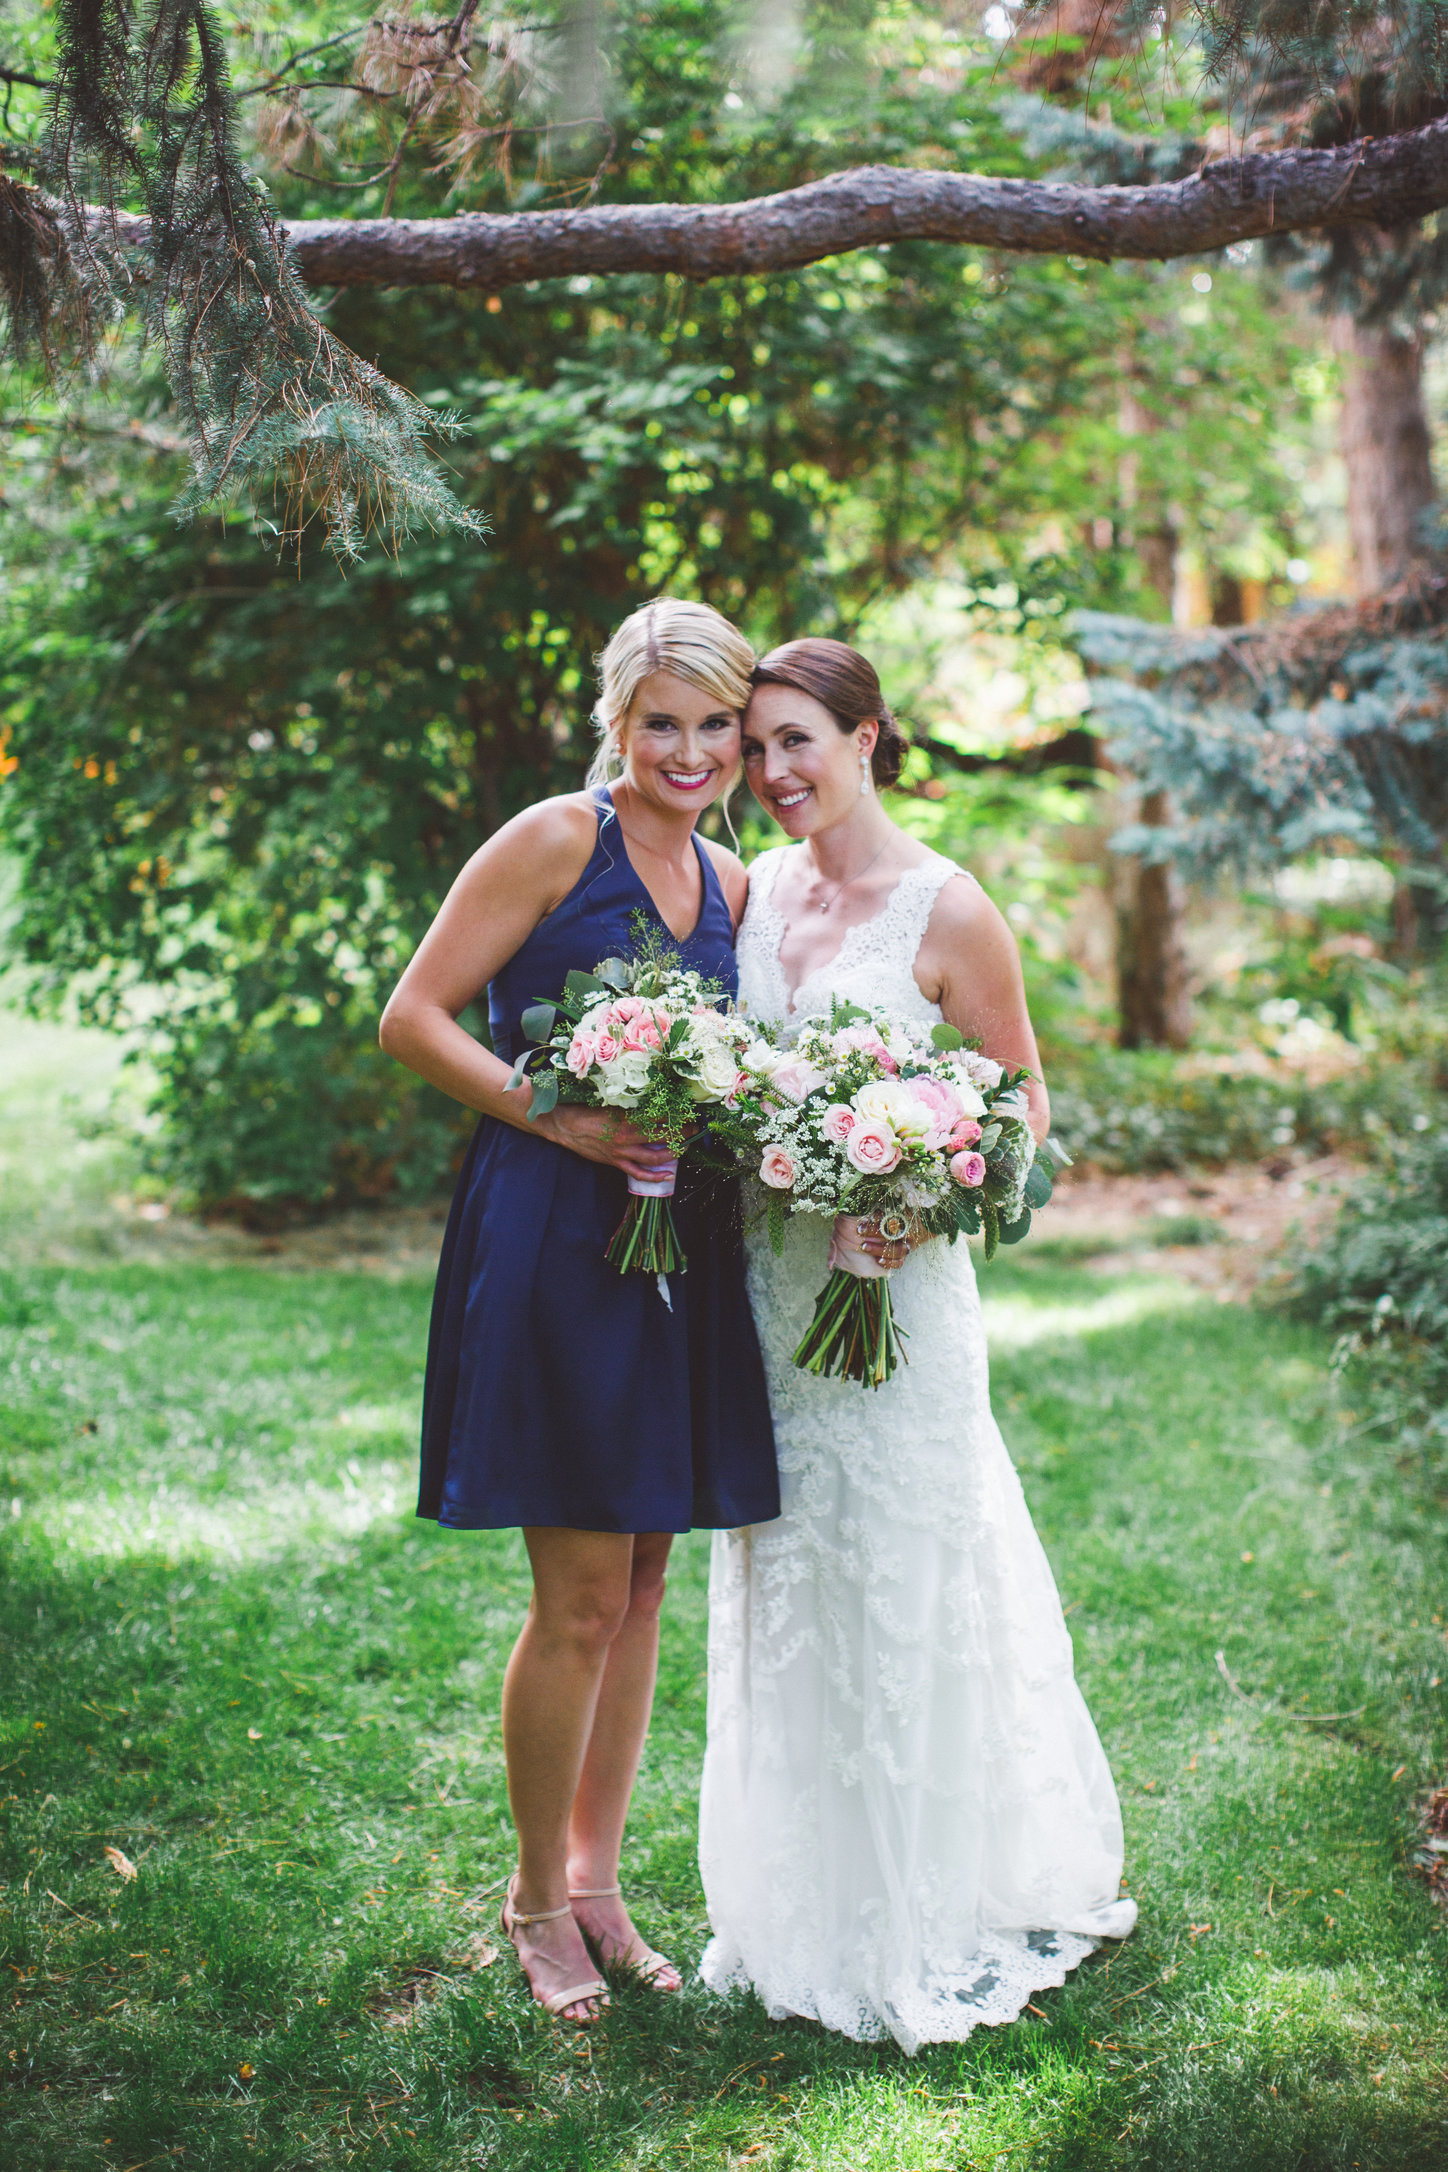 SandC-wedding-366.jpg